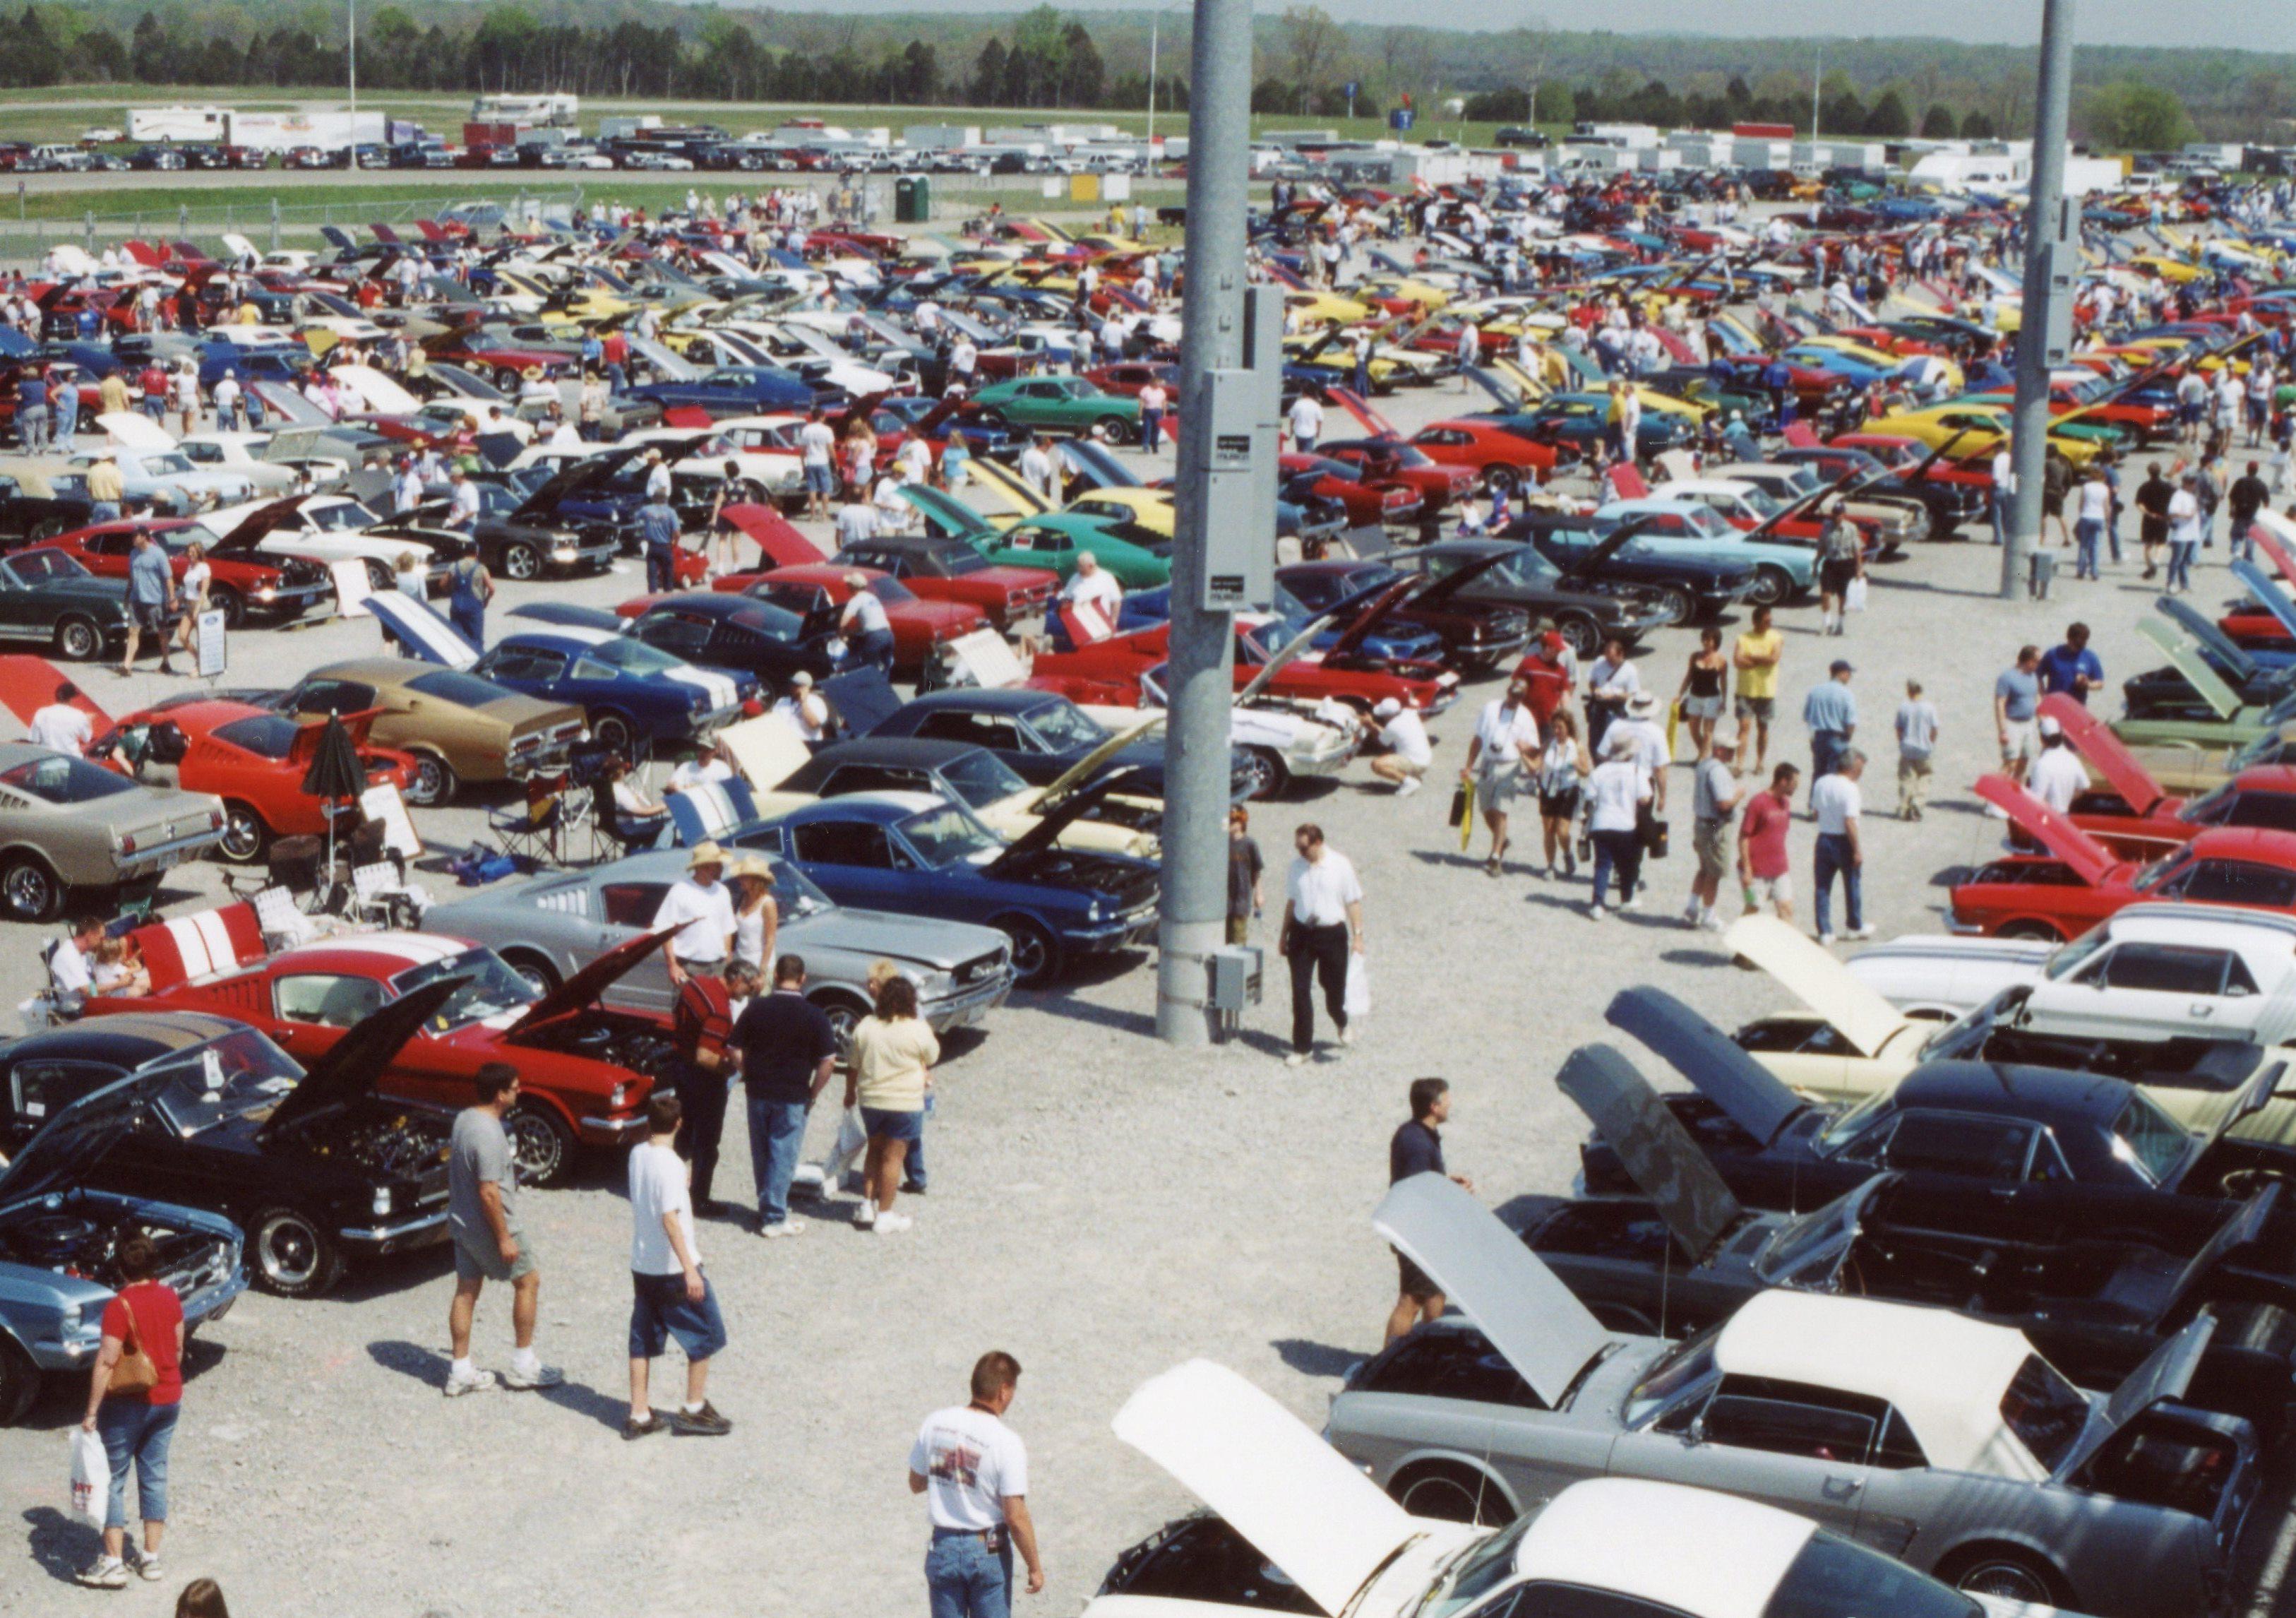 MCA 40th anniversary show field, Nashville TN